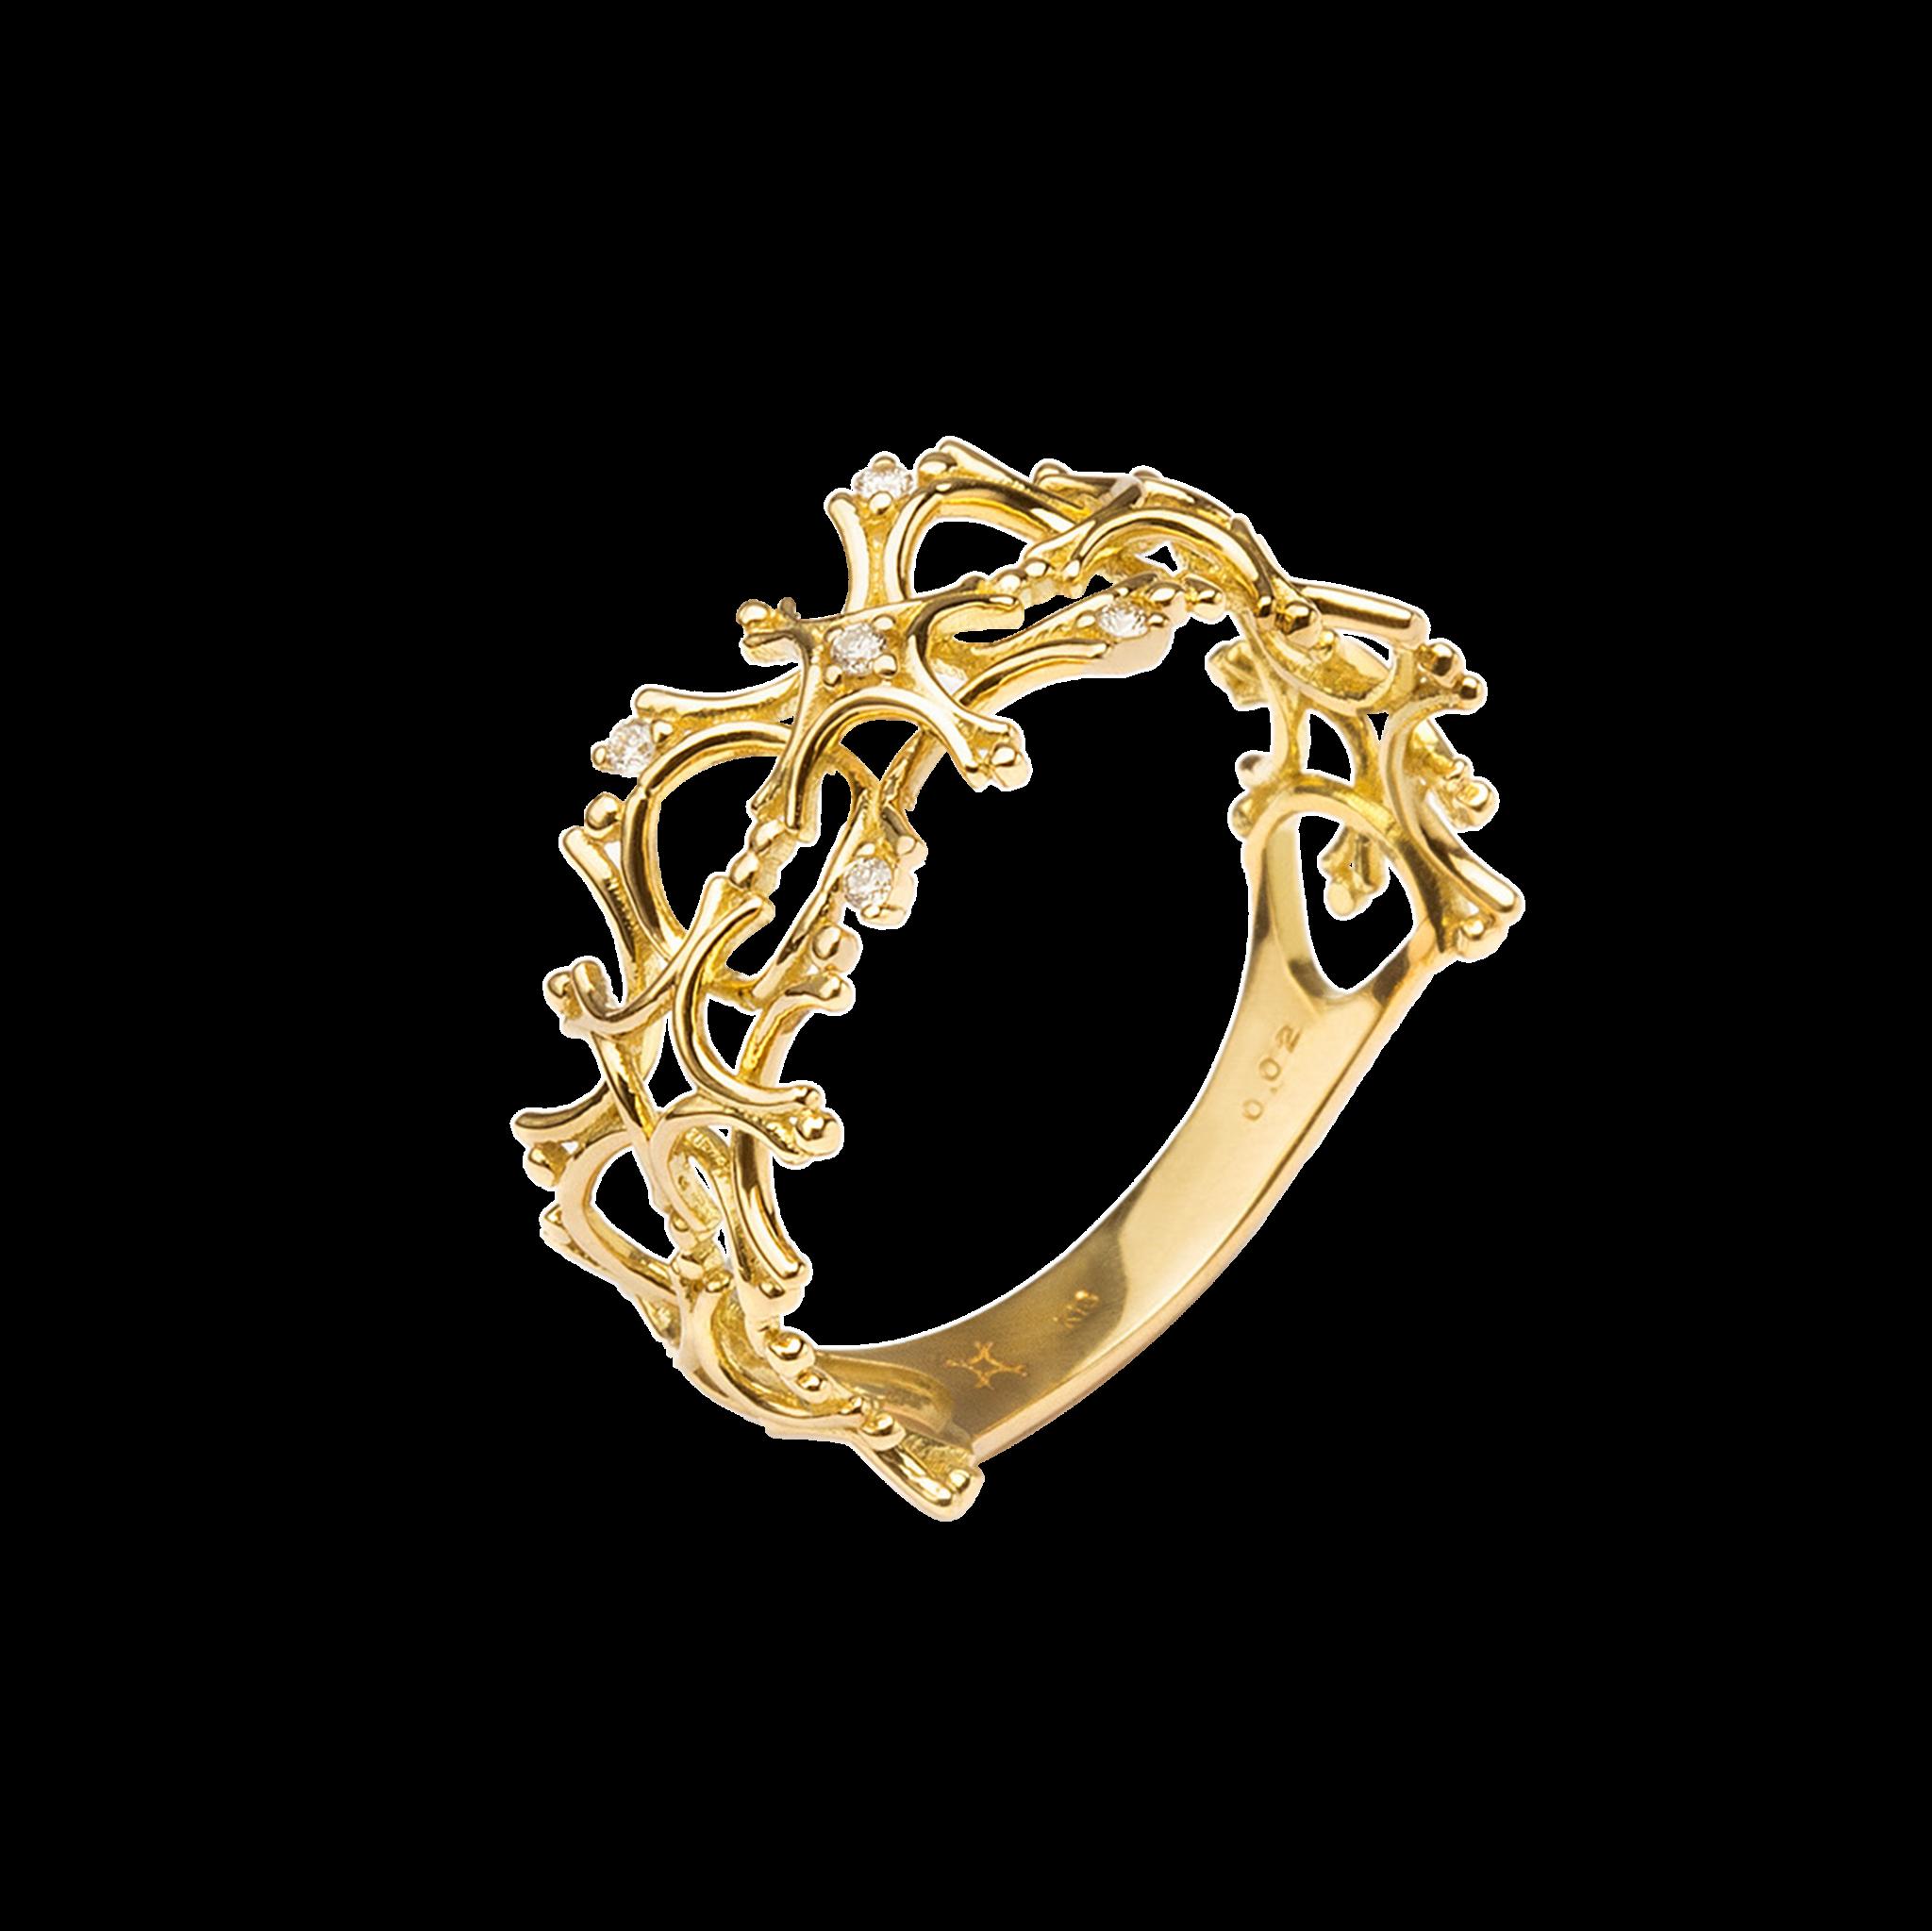 Flocon Collection 18K黄金 钻石 雪花戒指 4399